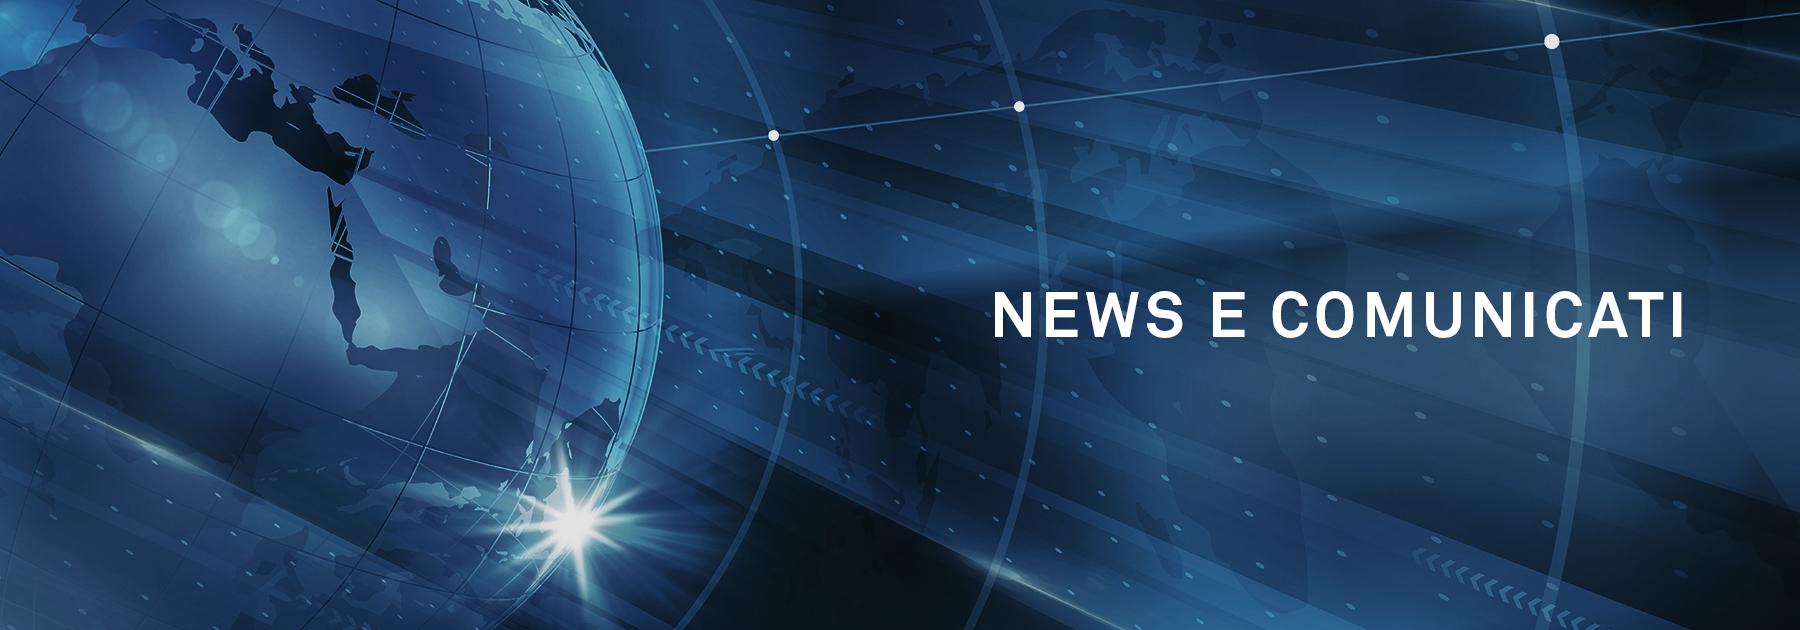 News e Comunicati